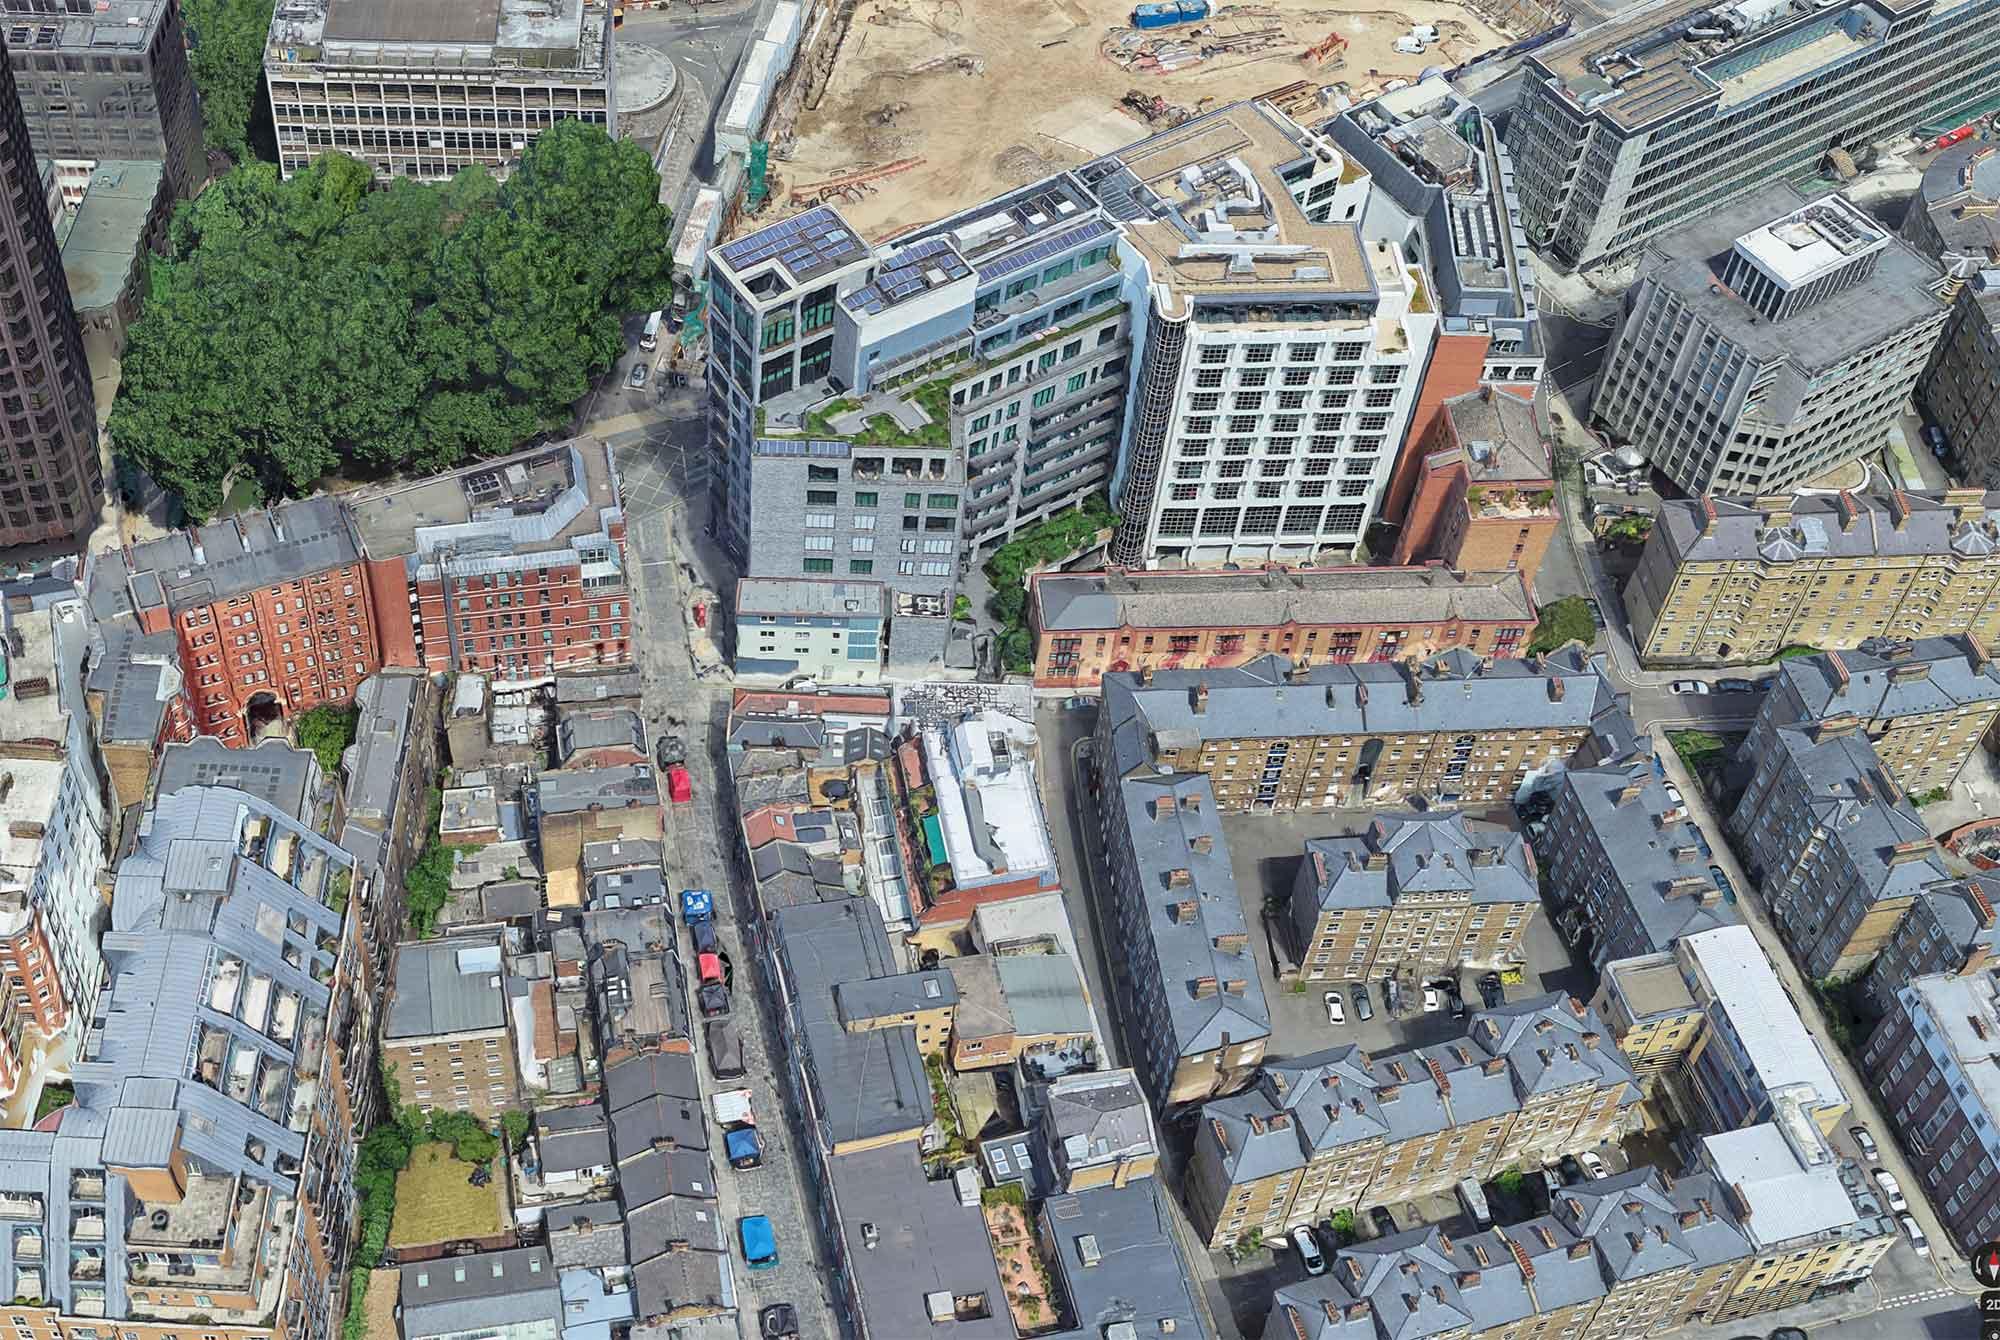 strutton-ground-openstudio-architects-south-elevationstrutton-ground-openstudio-architects-aerial-view